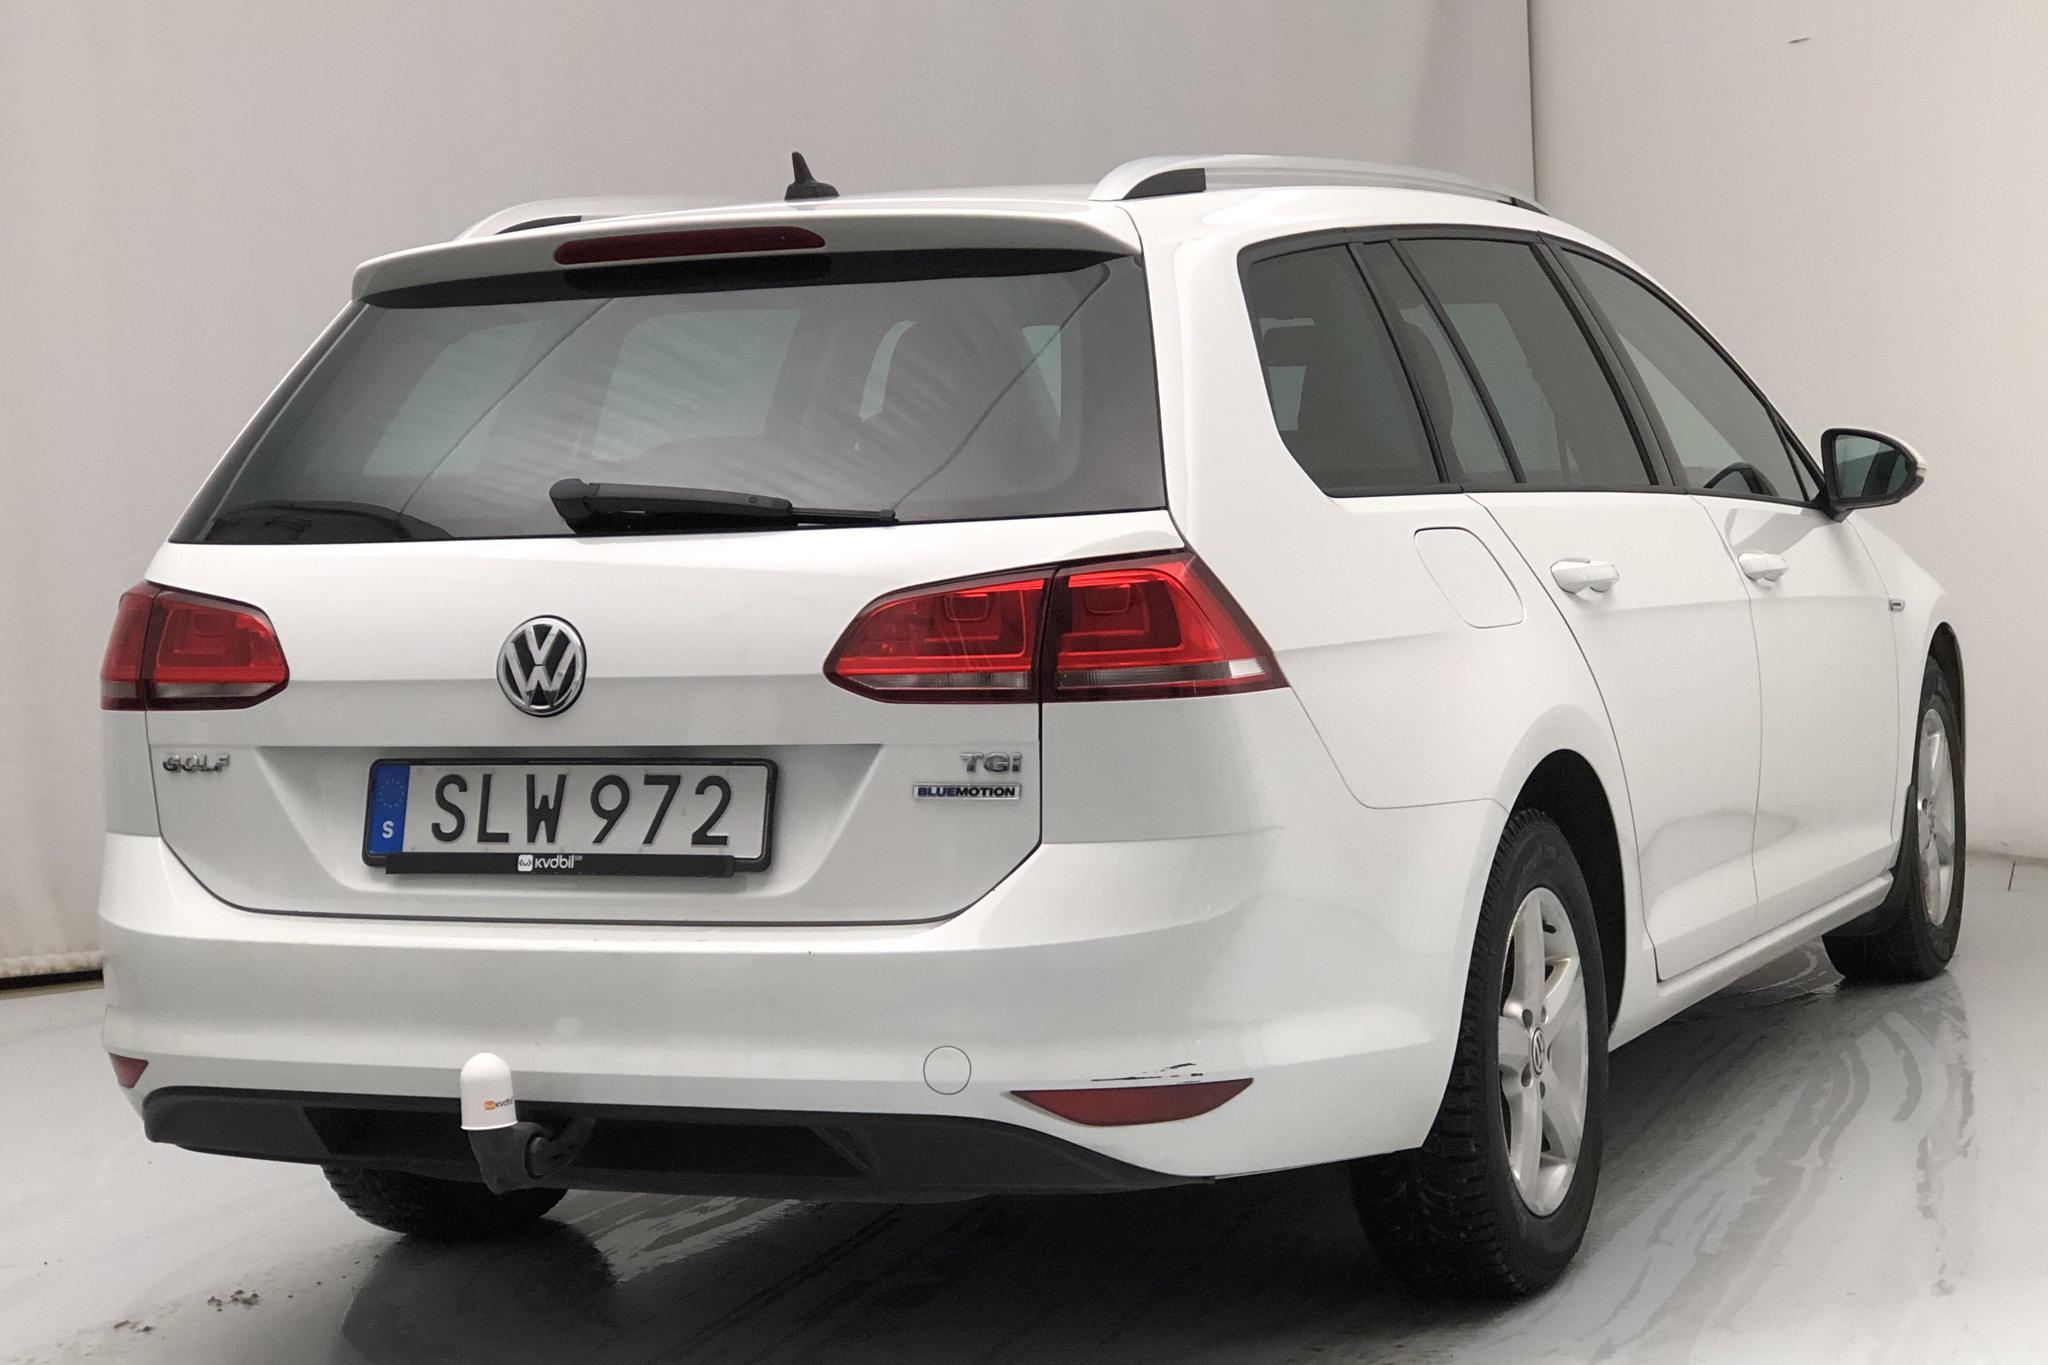 VW Golf VII 1.4 TGI BlueMotion Sportscombi (110hk) - 9 400 mil - Automat - vit - 2016